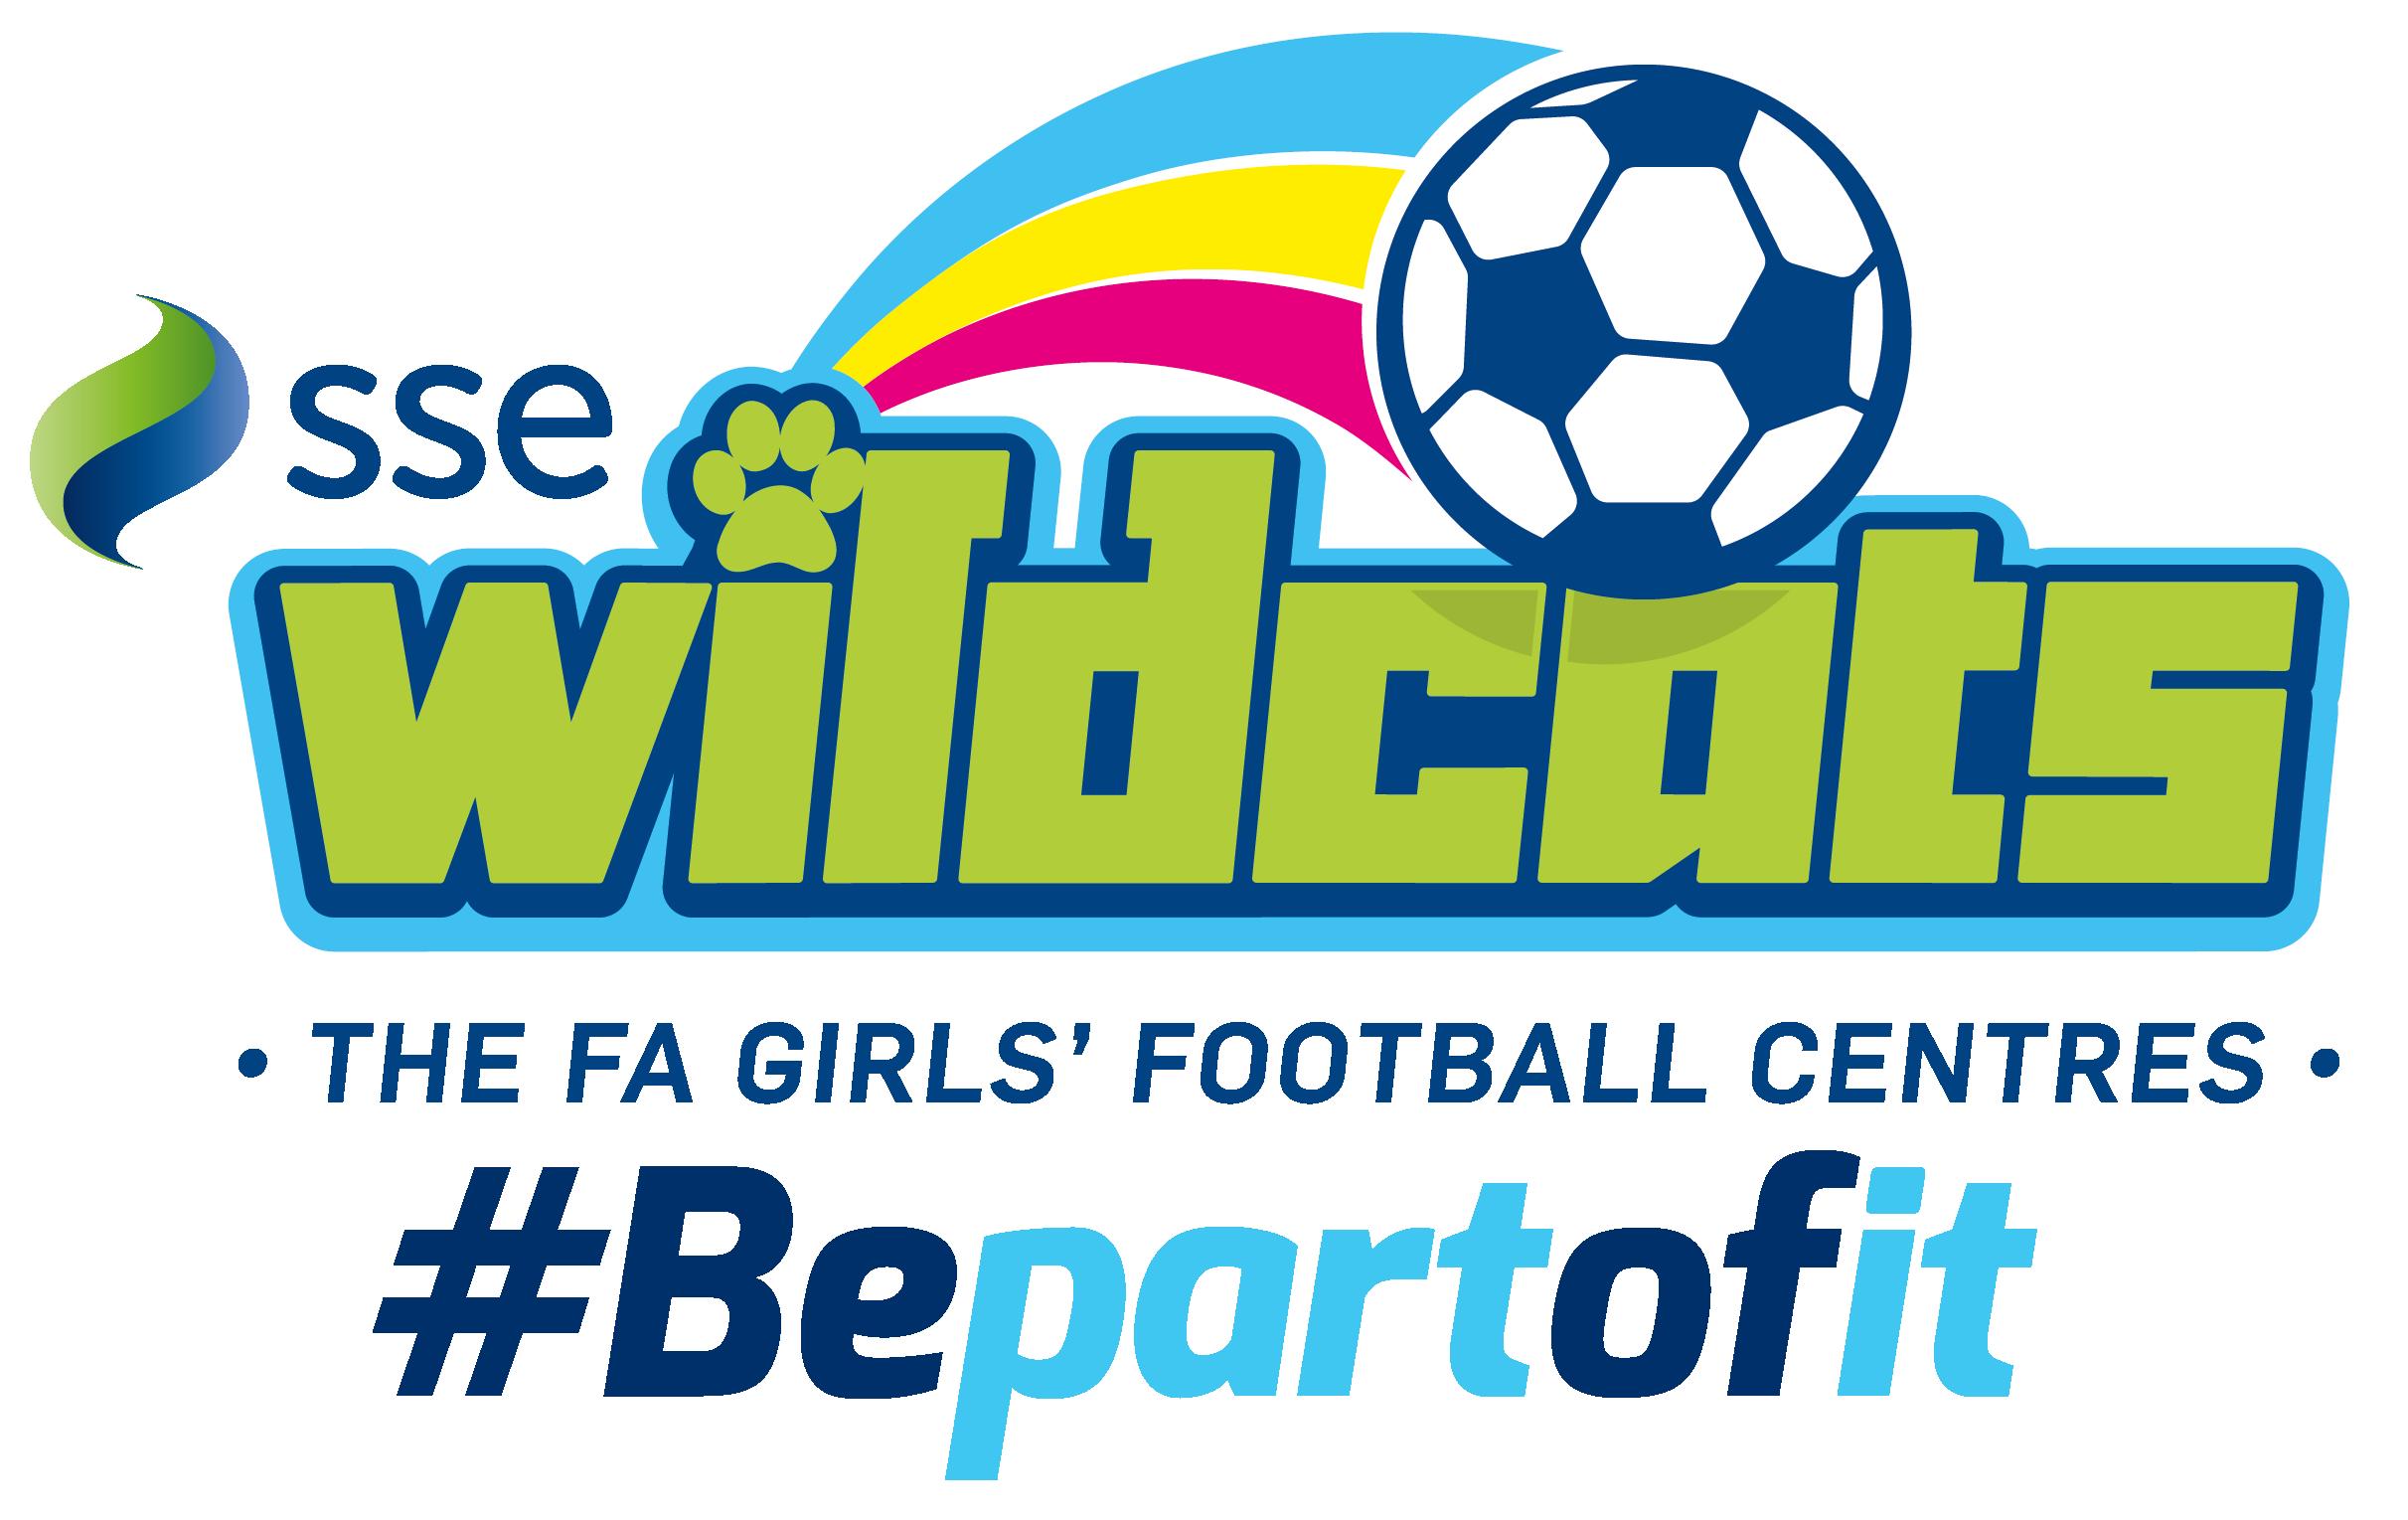 Shine Wildcats Girls' Football Squad